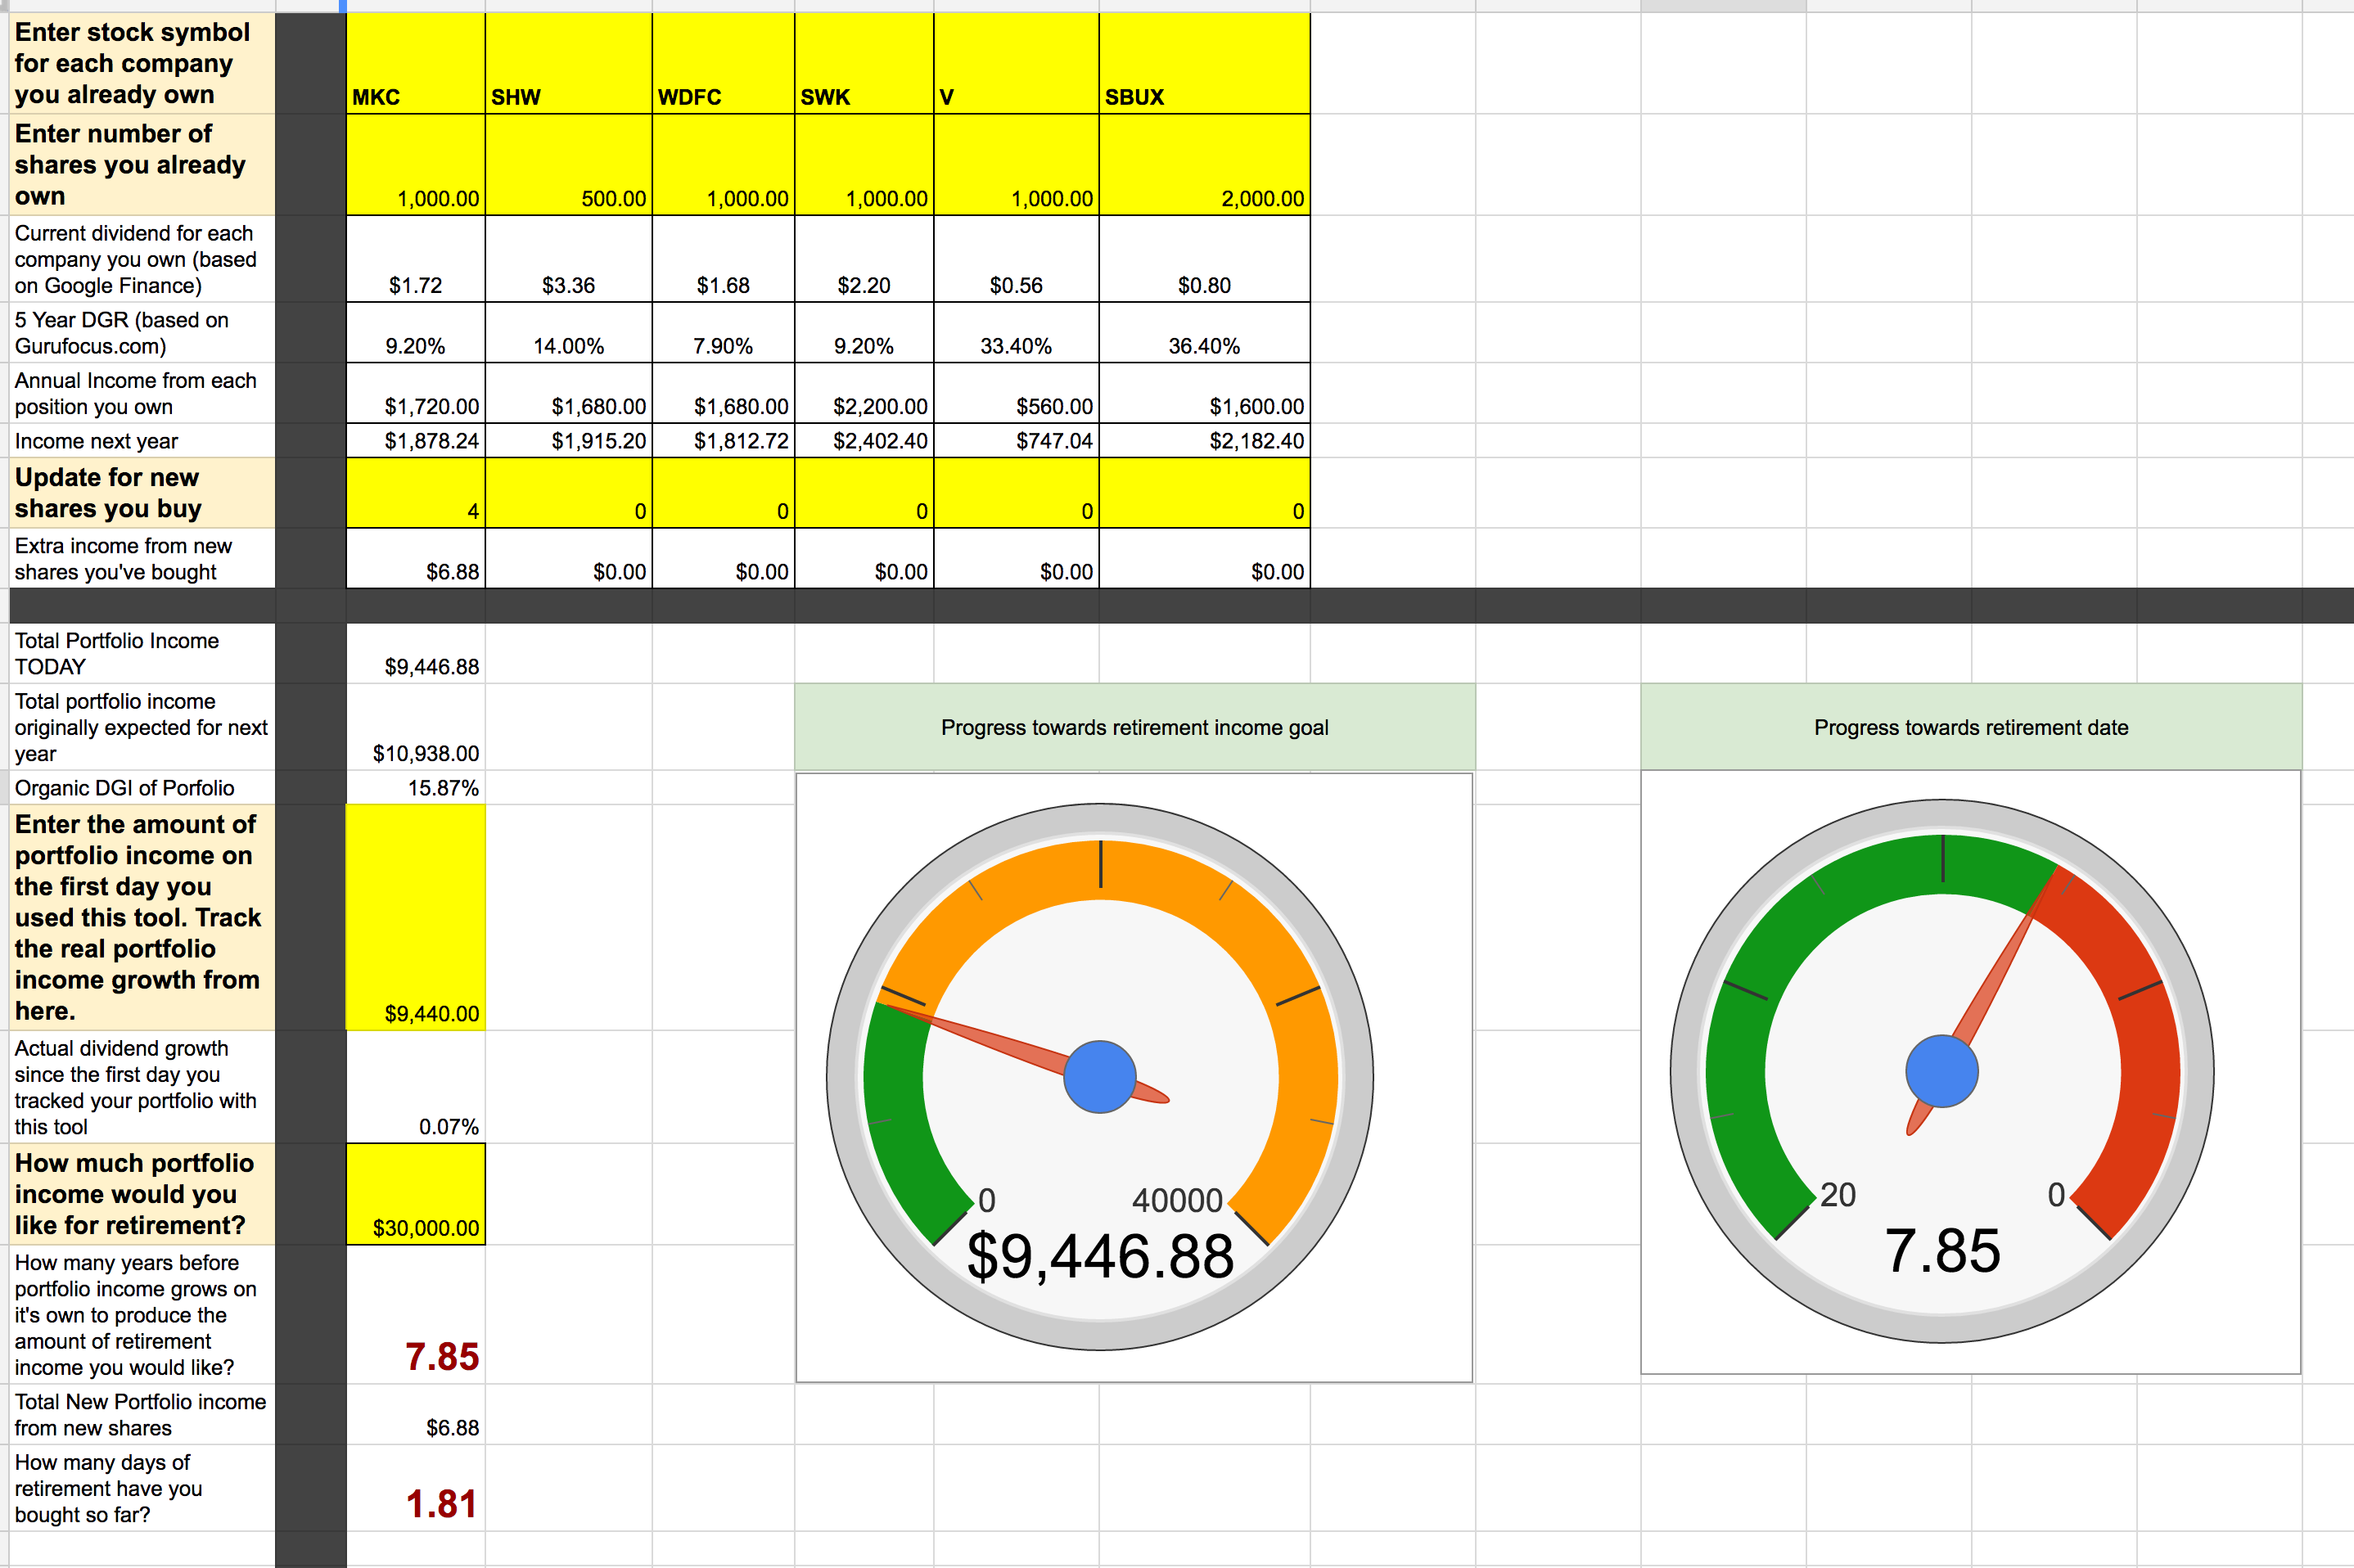 Tracking Your Progress Towards Enough Portfolio Income For Retirement